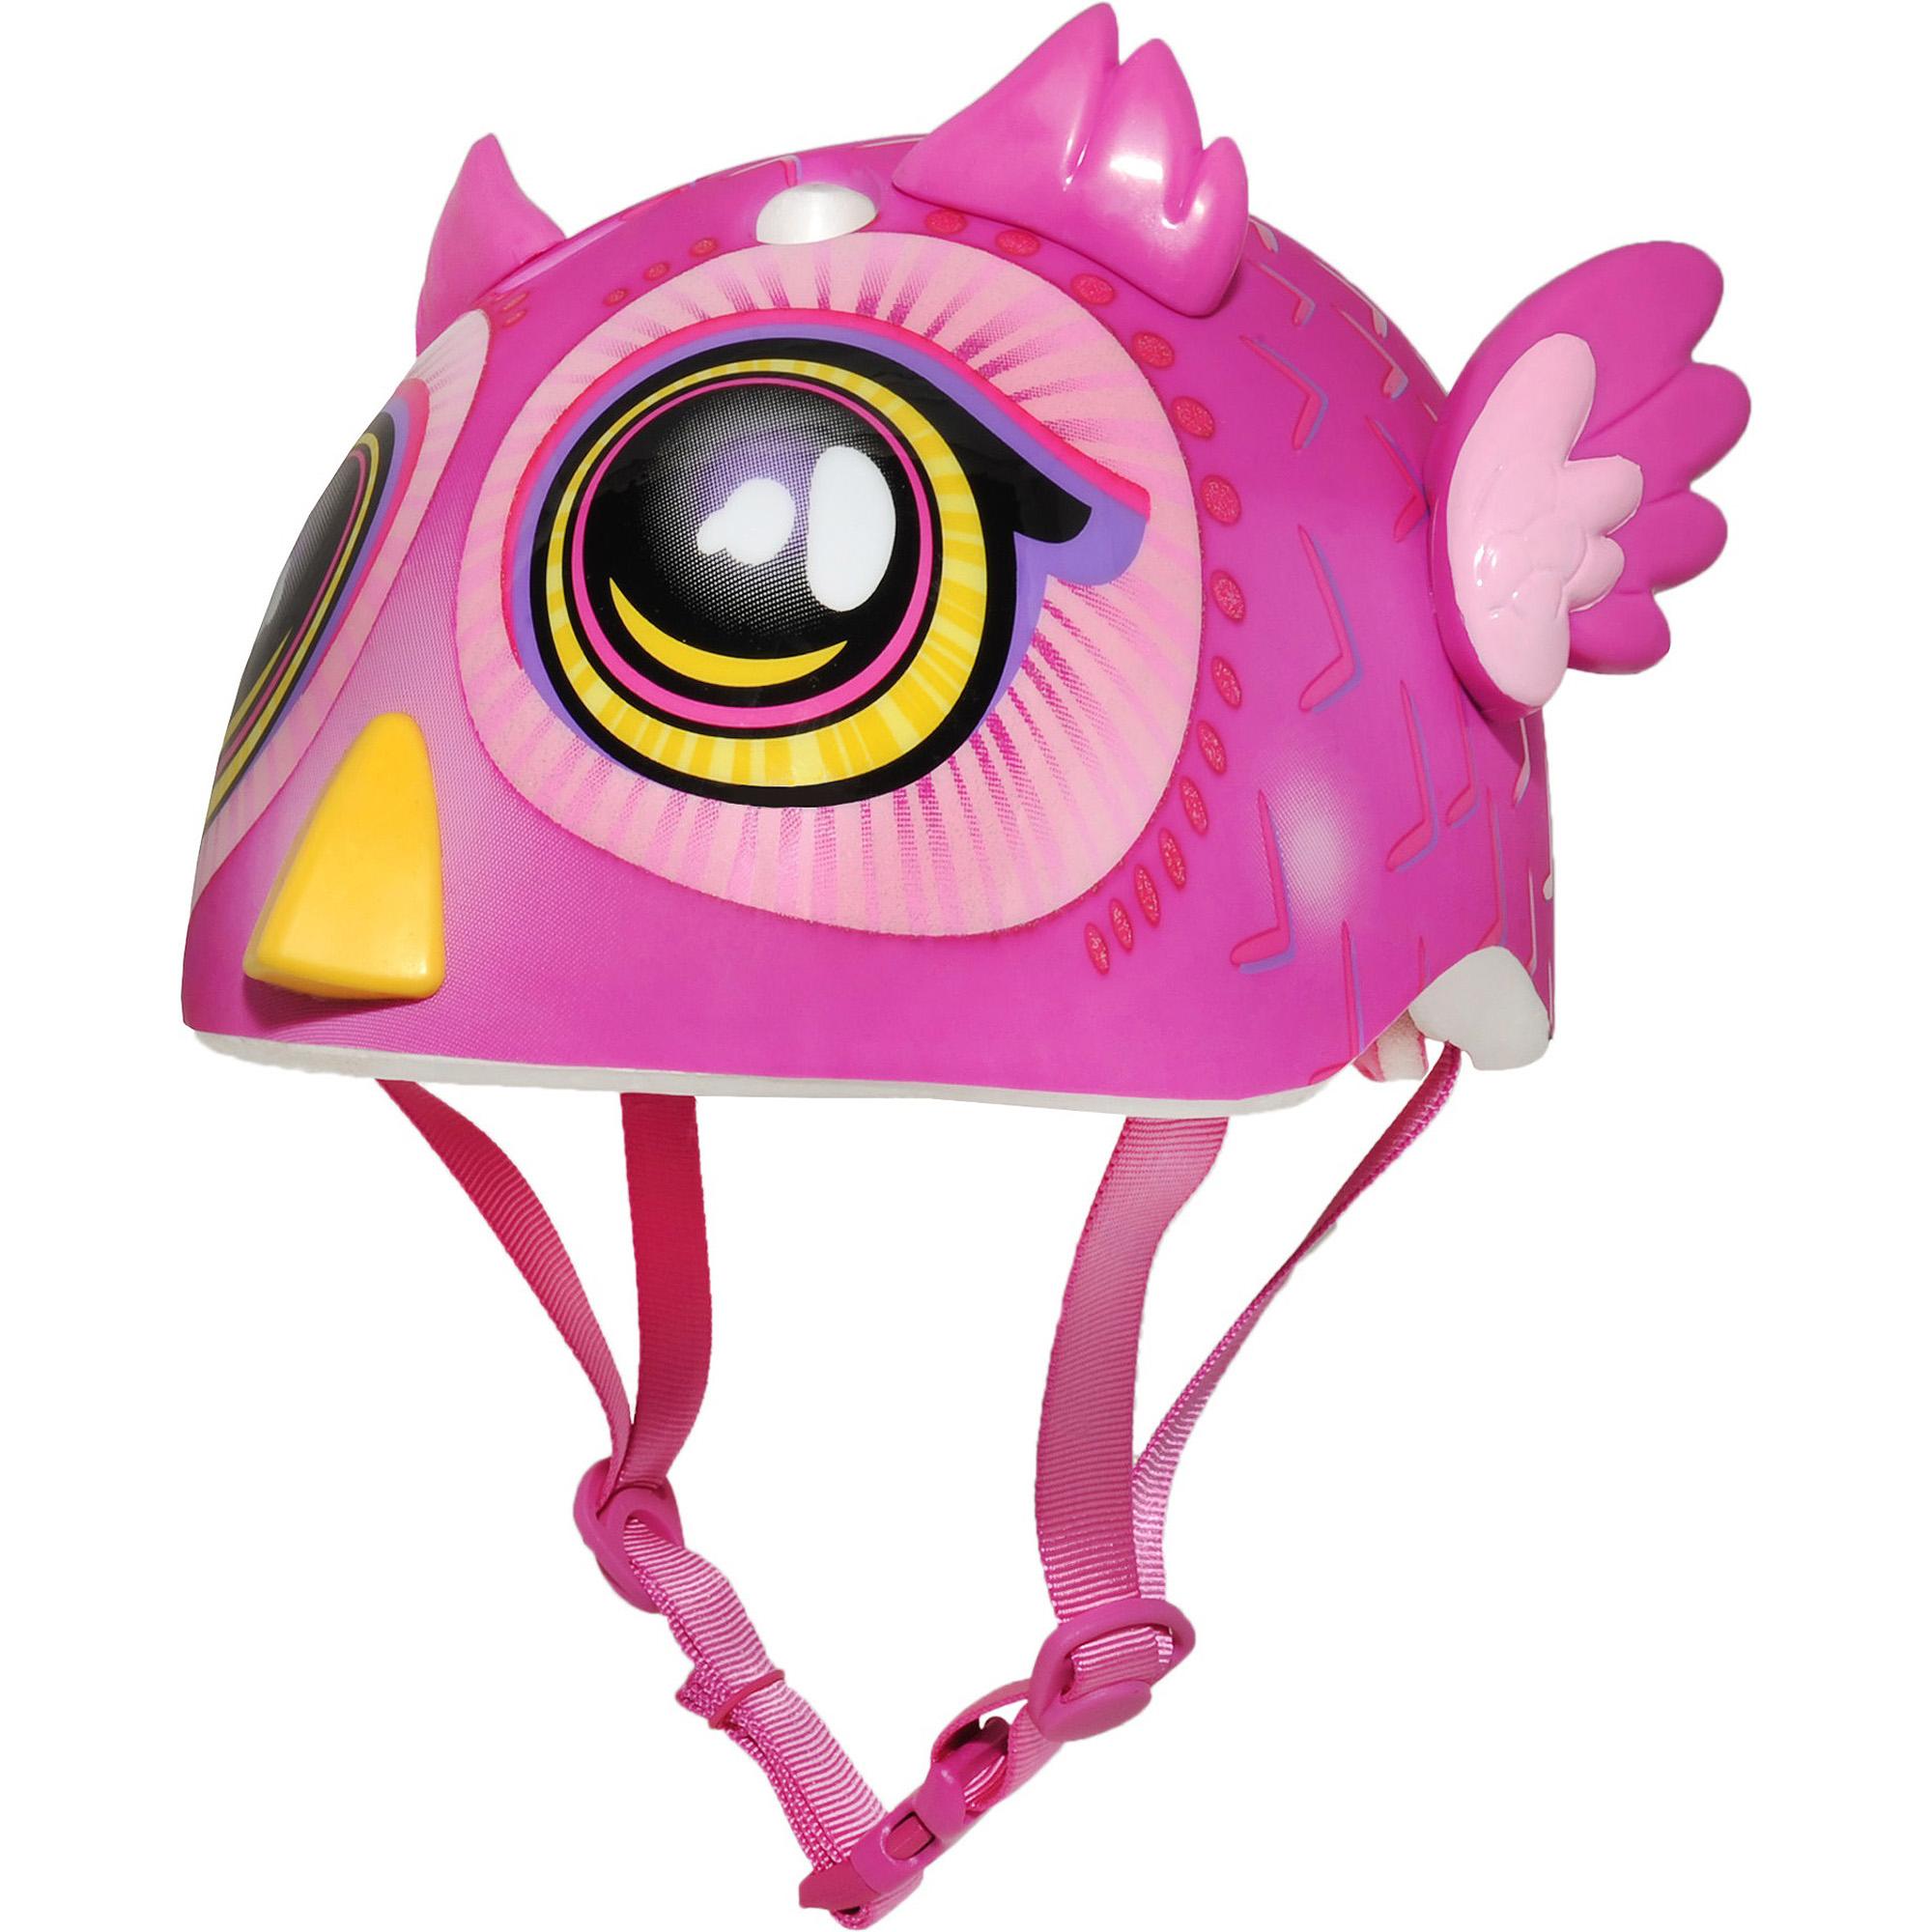 Raskullz Big Eyes Owl Miniz Bike Helmet, Toddler (18-24mos)